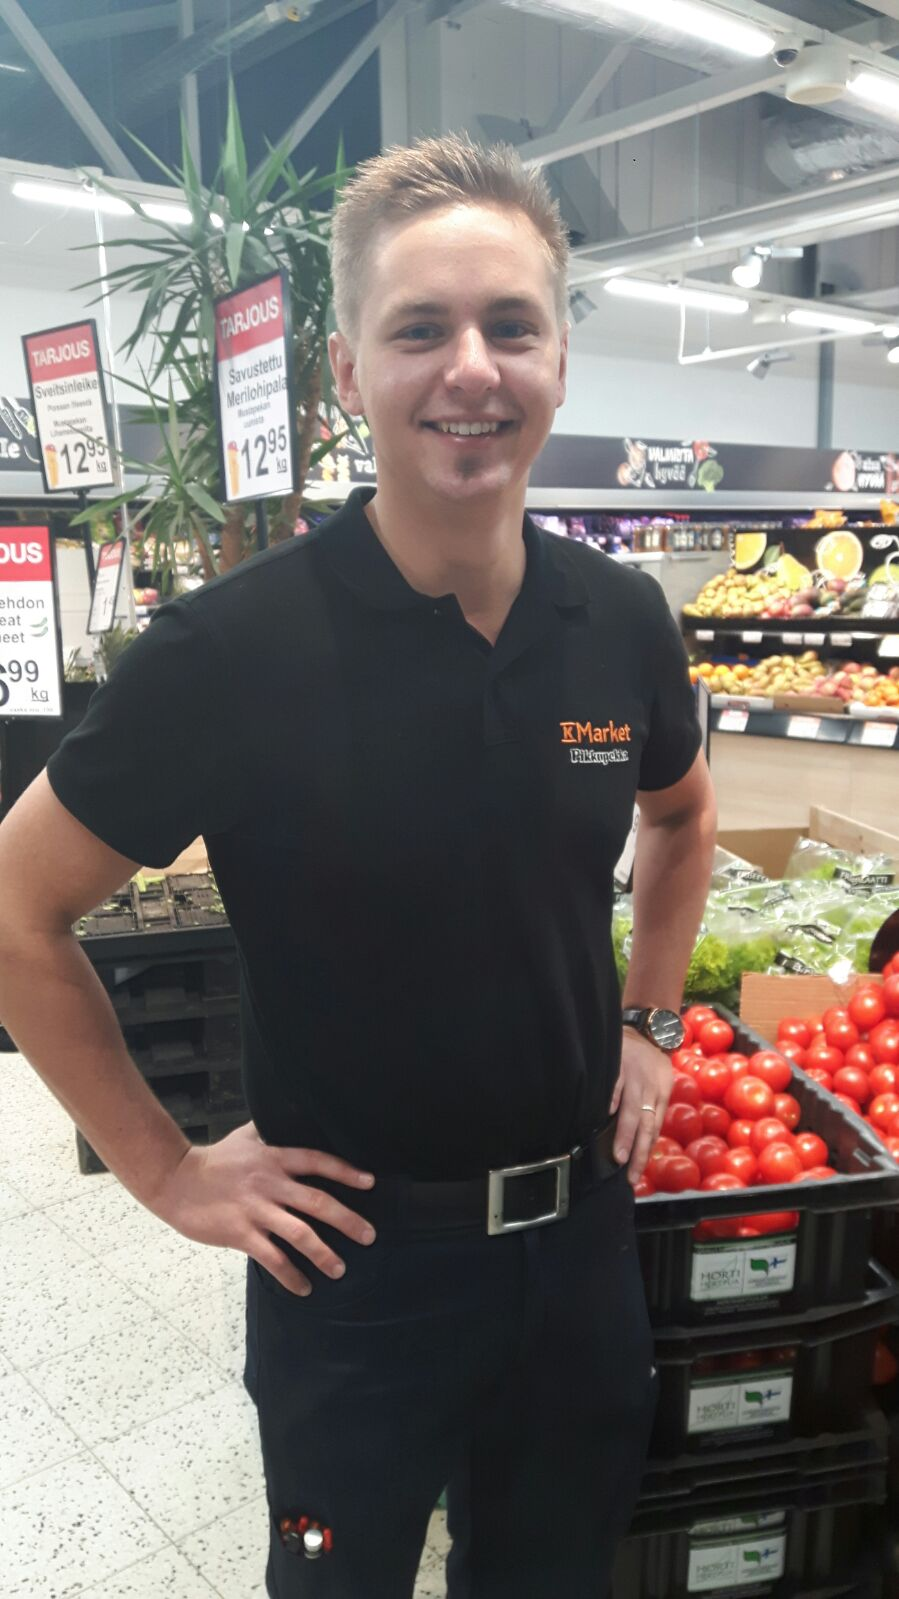 K-Market Hakalantori